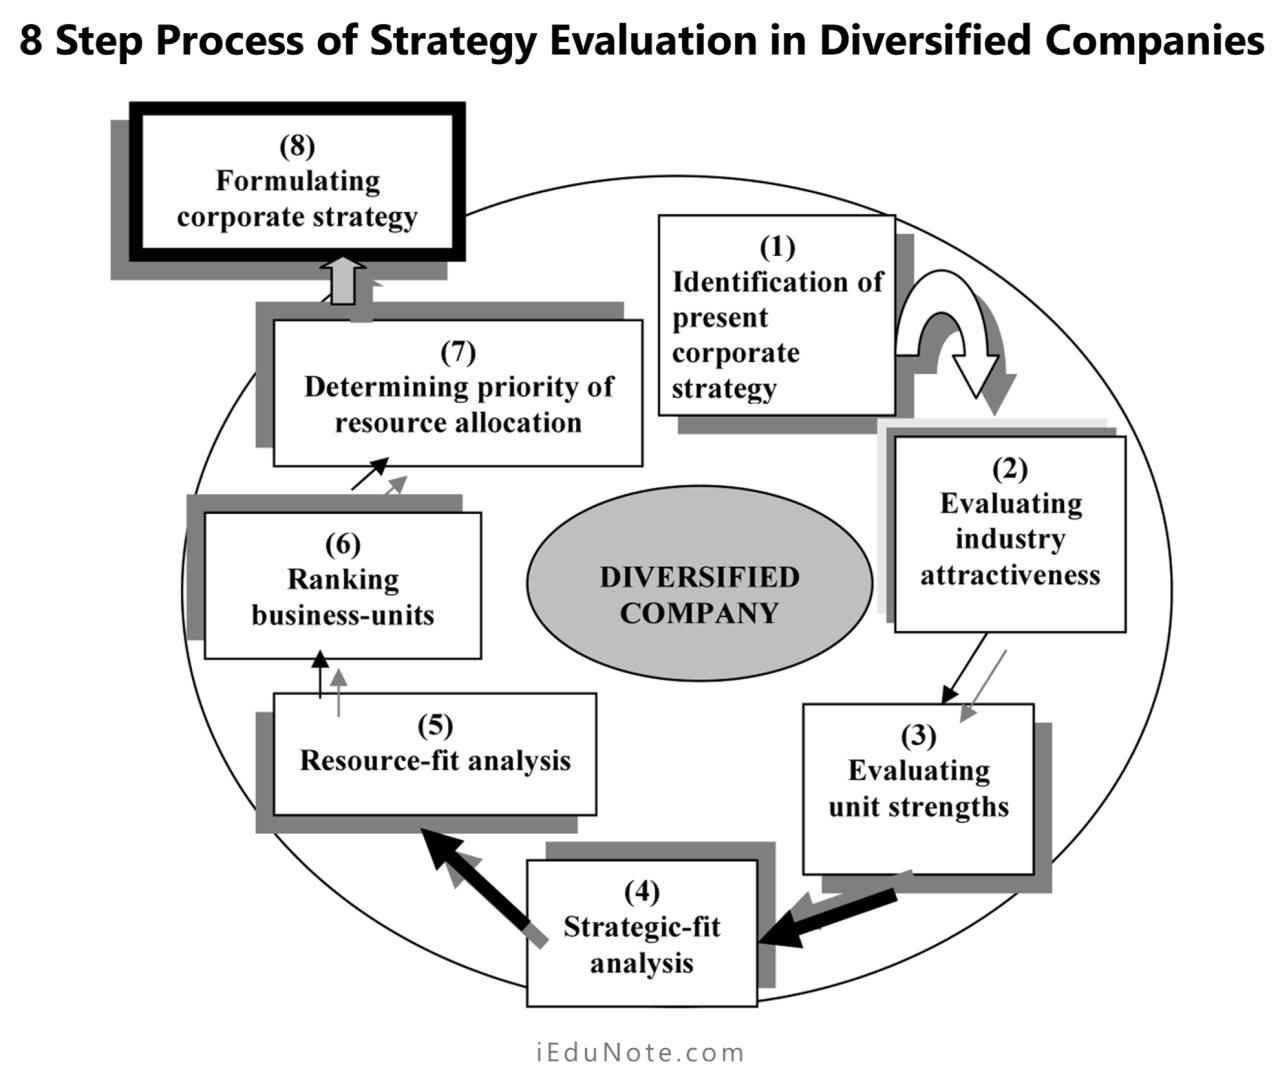 Evaluating Strategies of Diversified Companies in 8 Steps